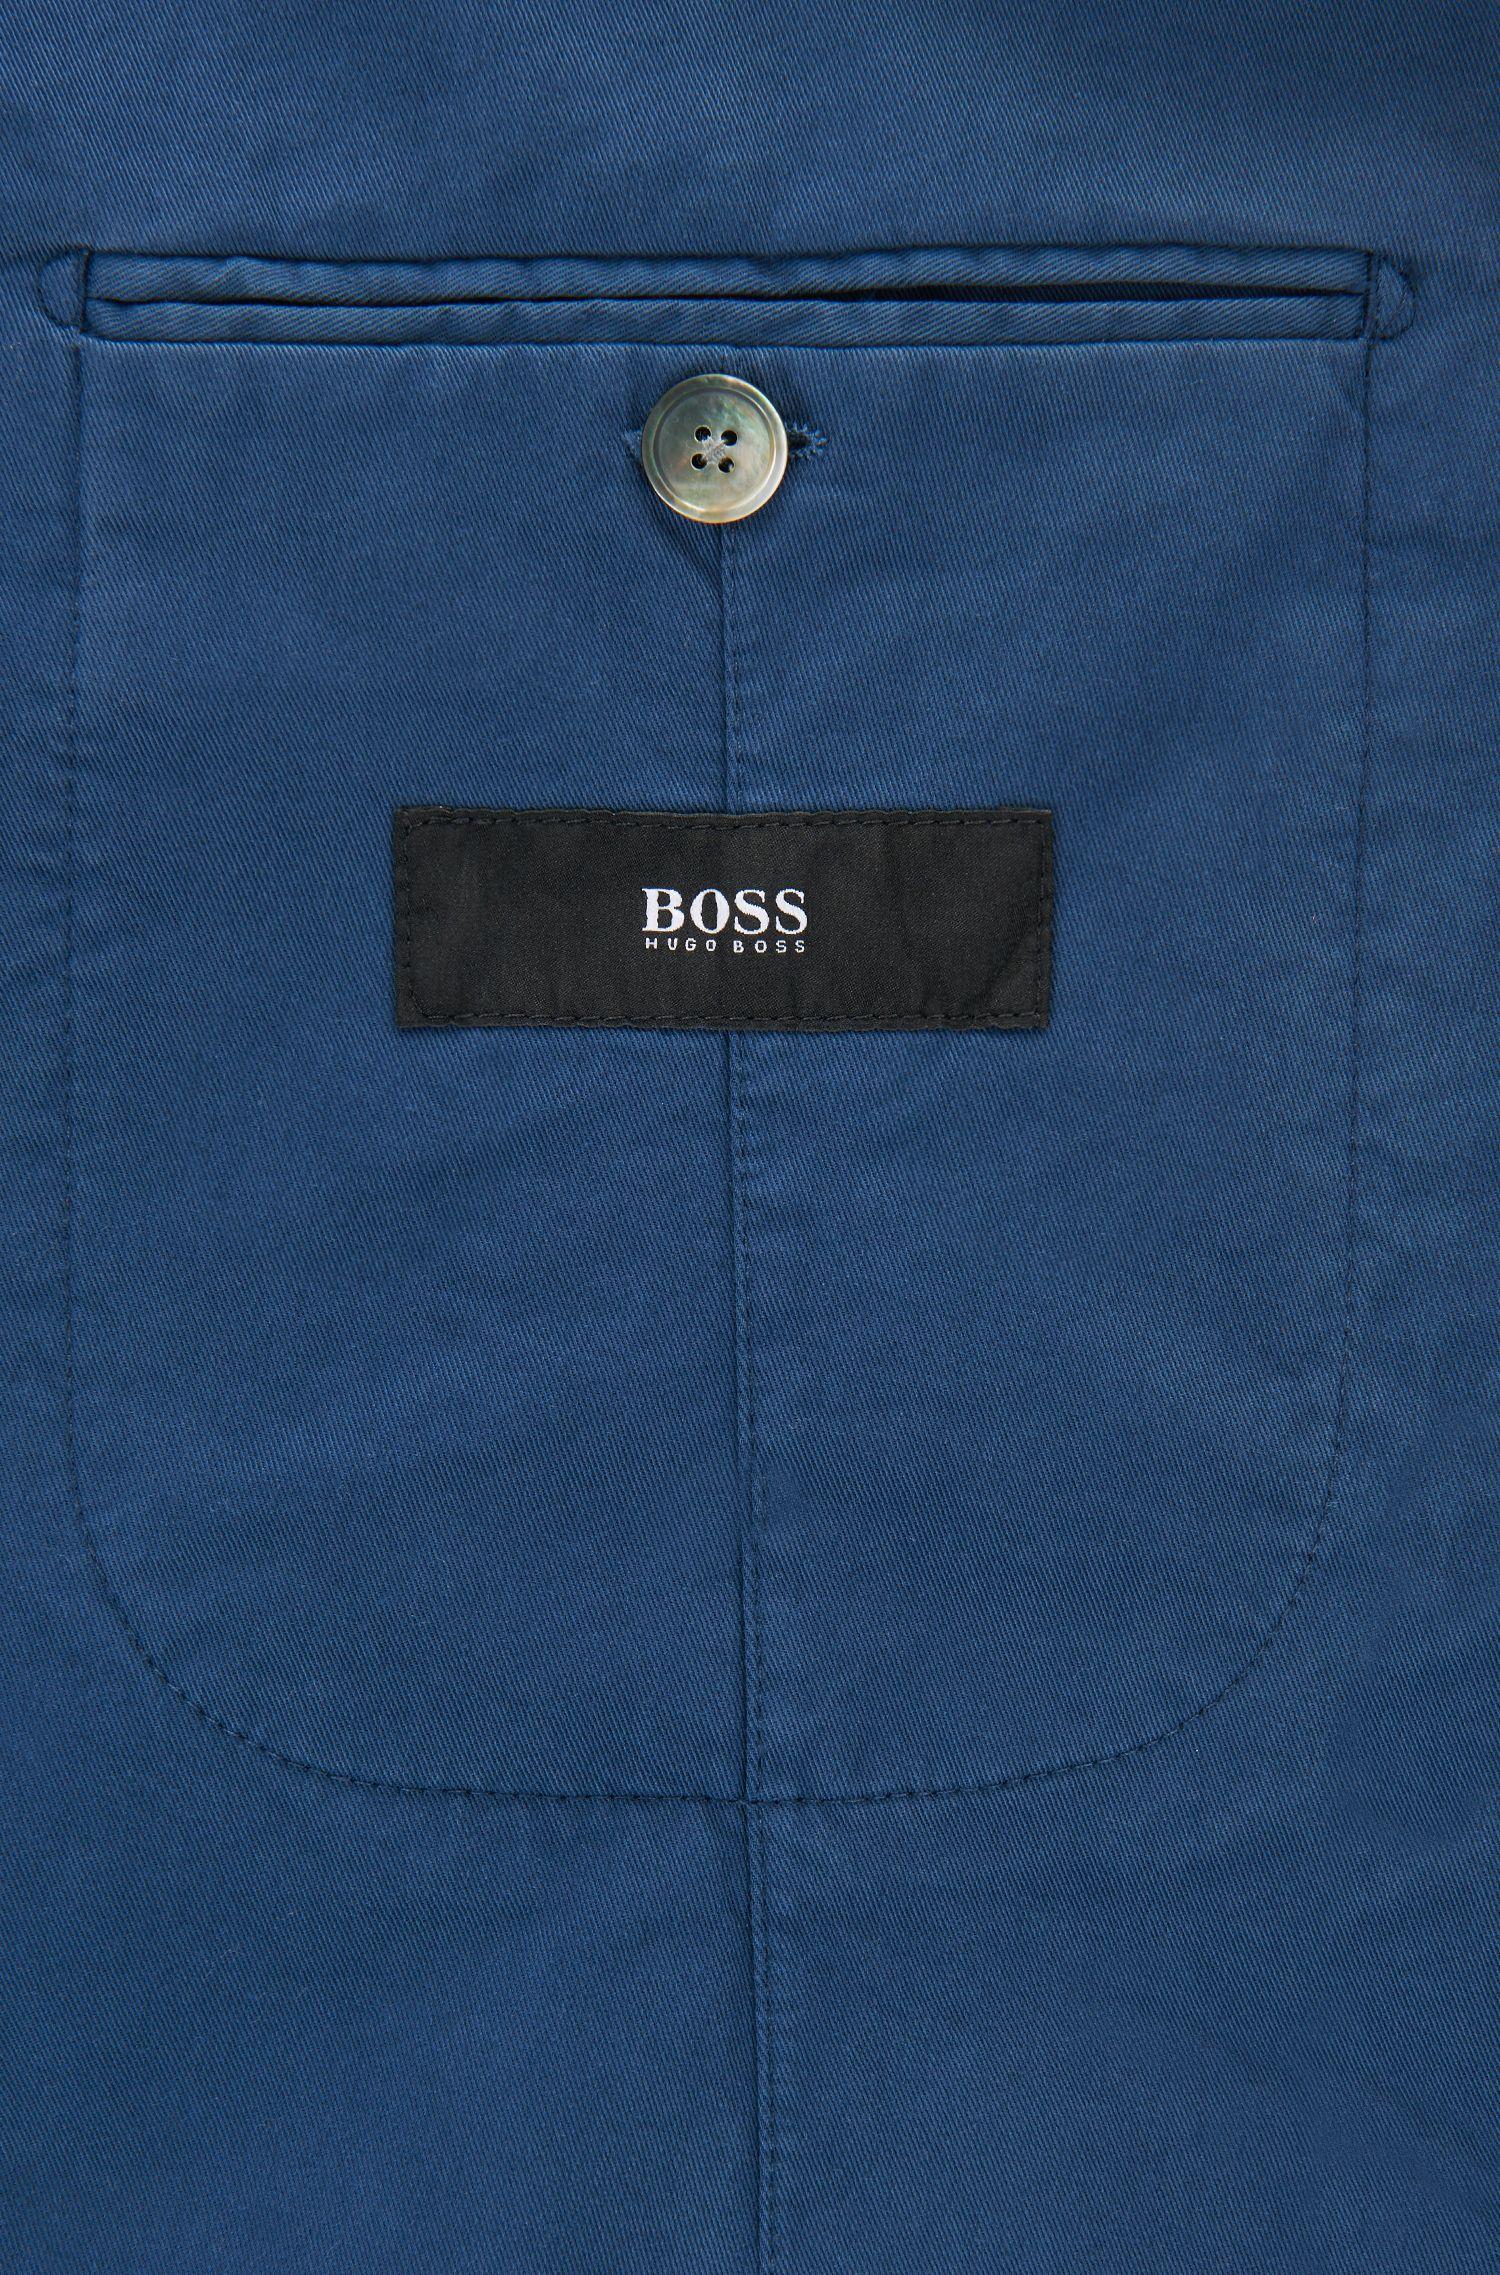 Garment-Dyed Stretch Cotton Sport Coat, Slim Fit | Hanry D, Open Blue